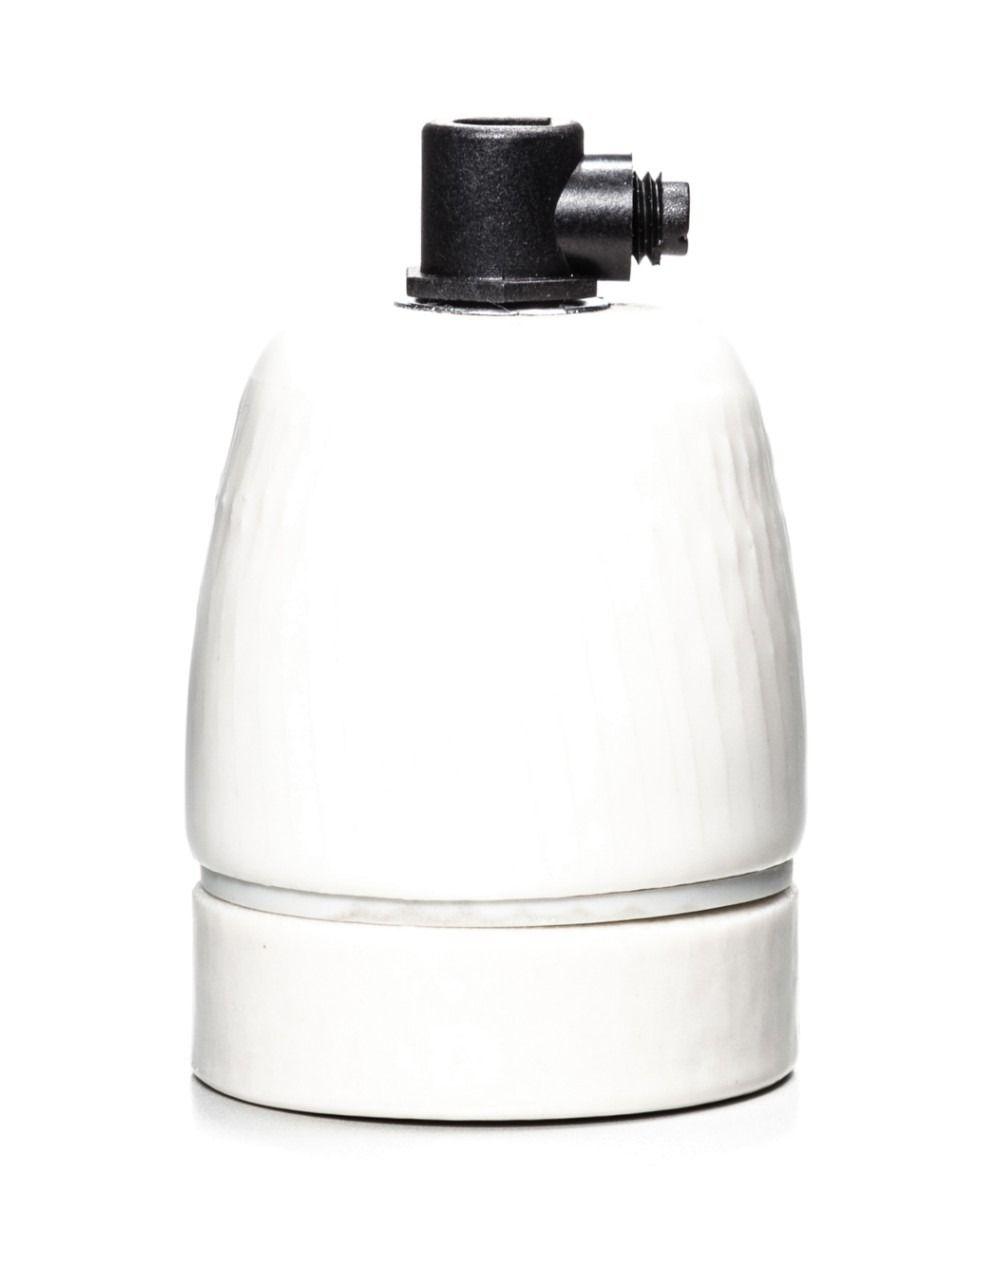 Cord Grip E27 Ceramic Lamp Holders Black White Gasket Ceramics Bulb